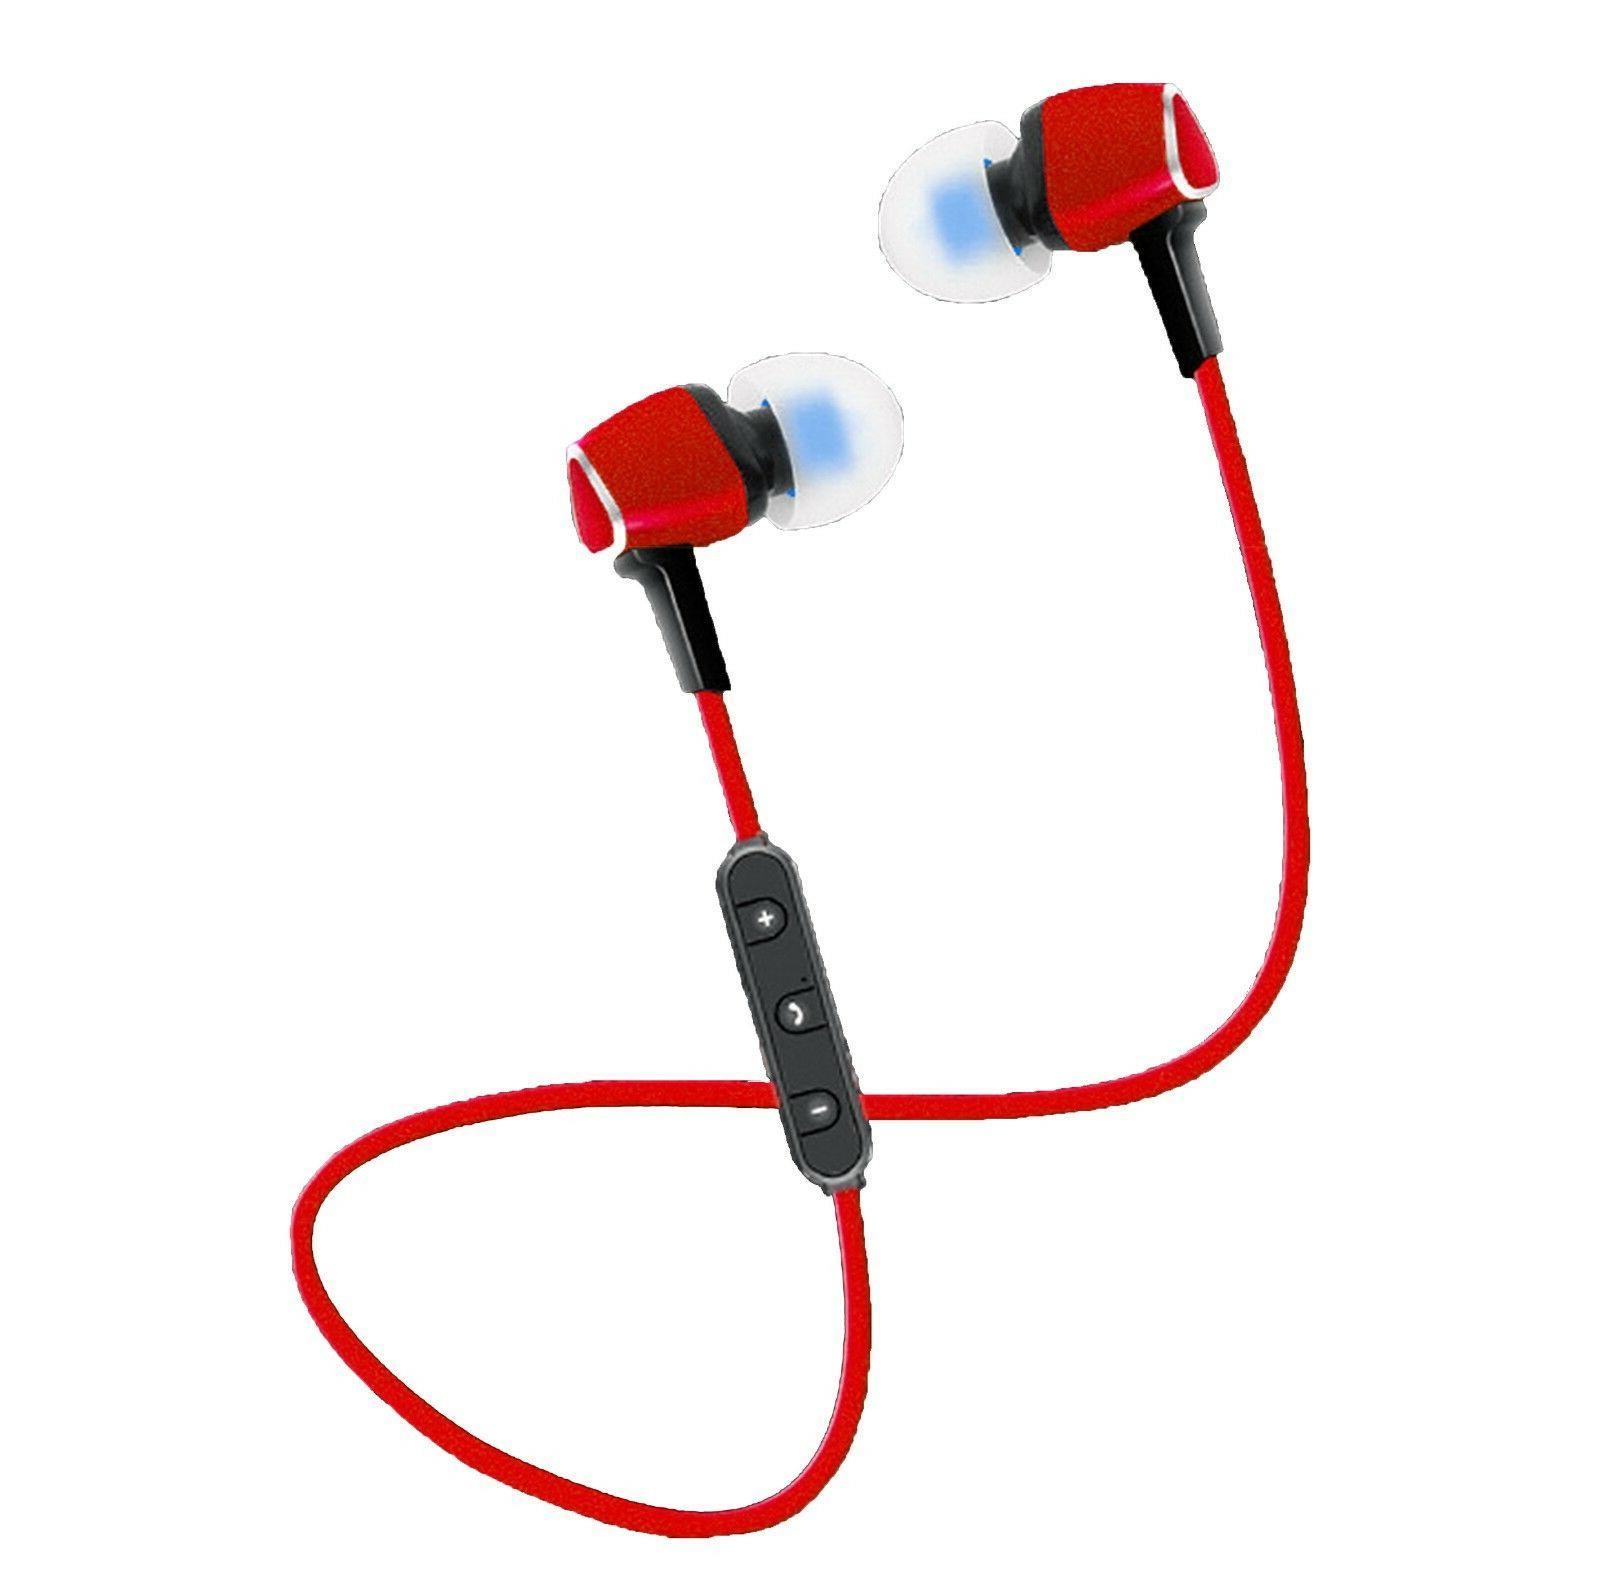 Kivi Stereo Sports Earbud/Headset